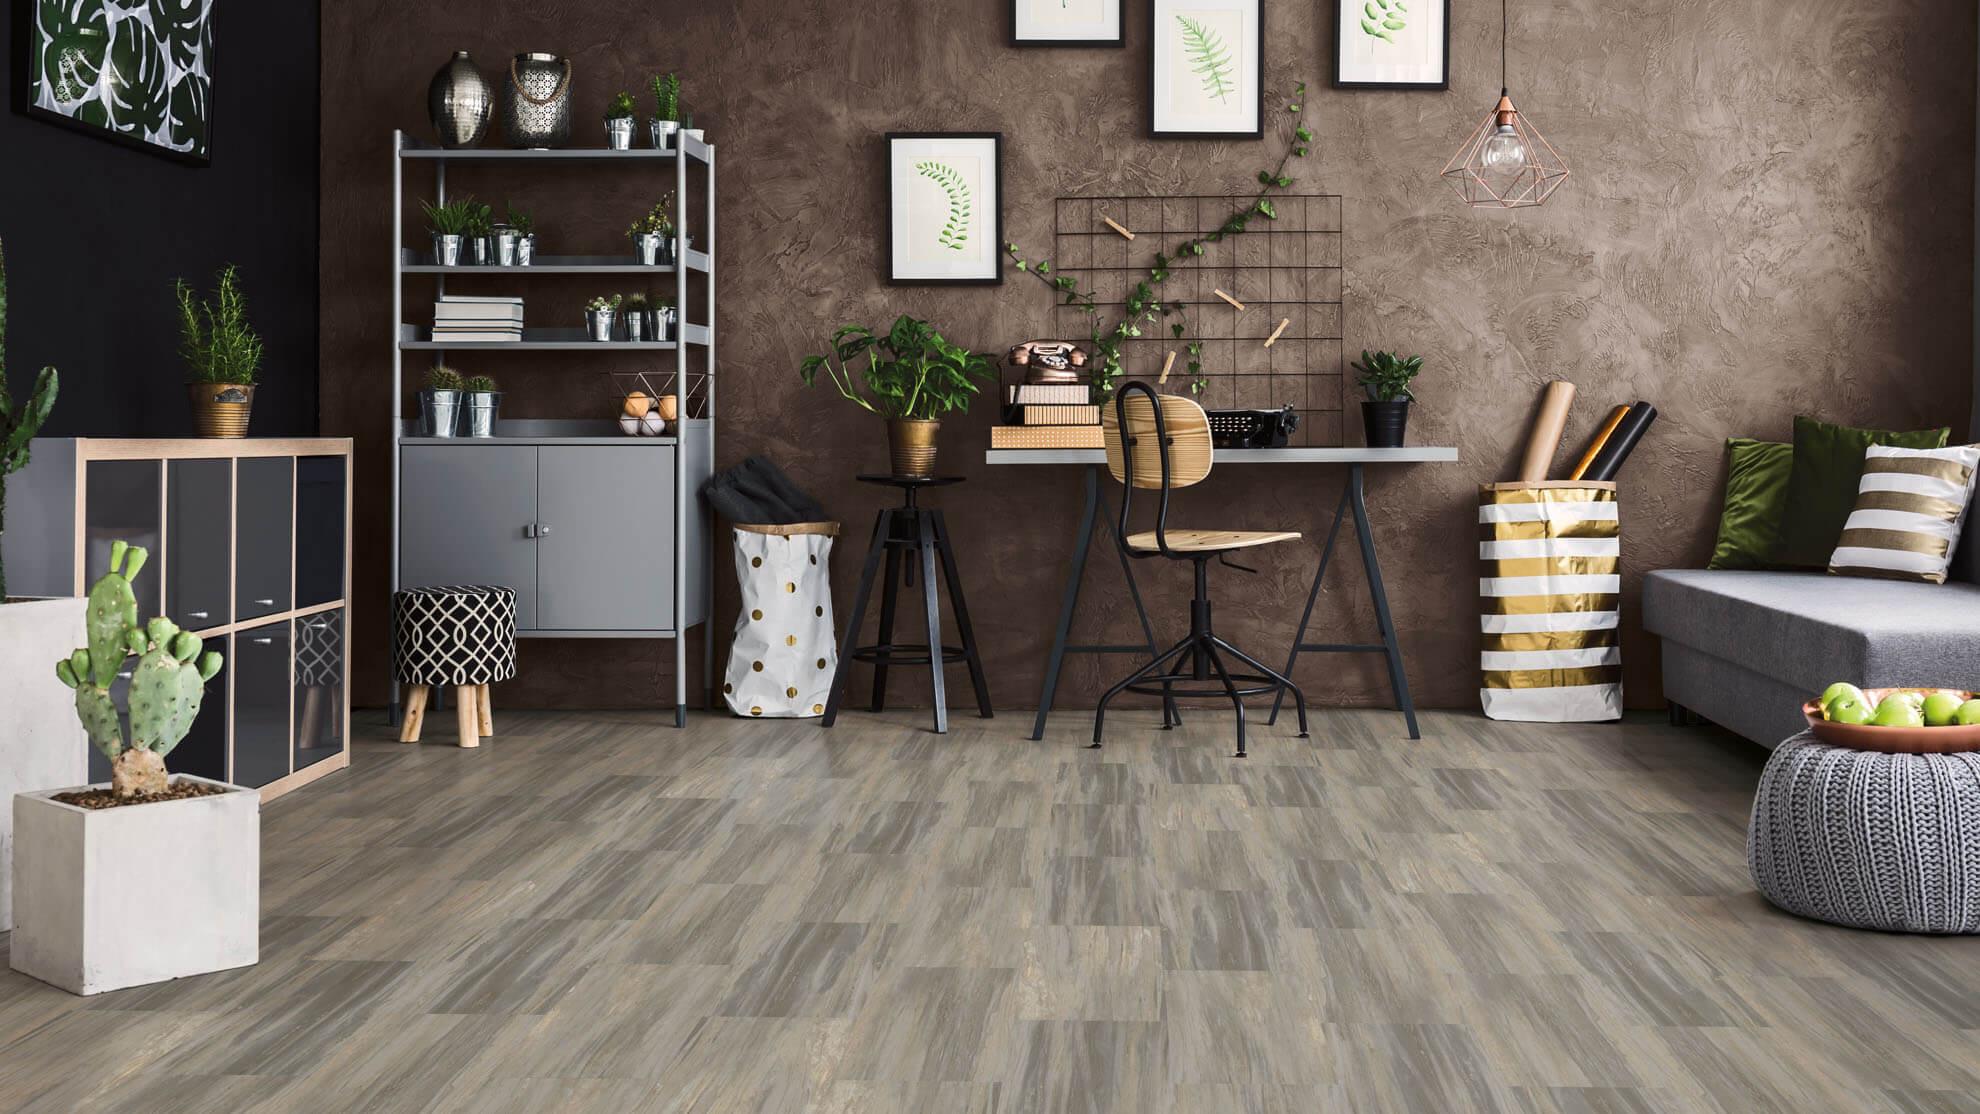 hardwood floor installation dallas of earthwerks flooring within parkhill tile pkt 371